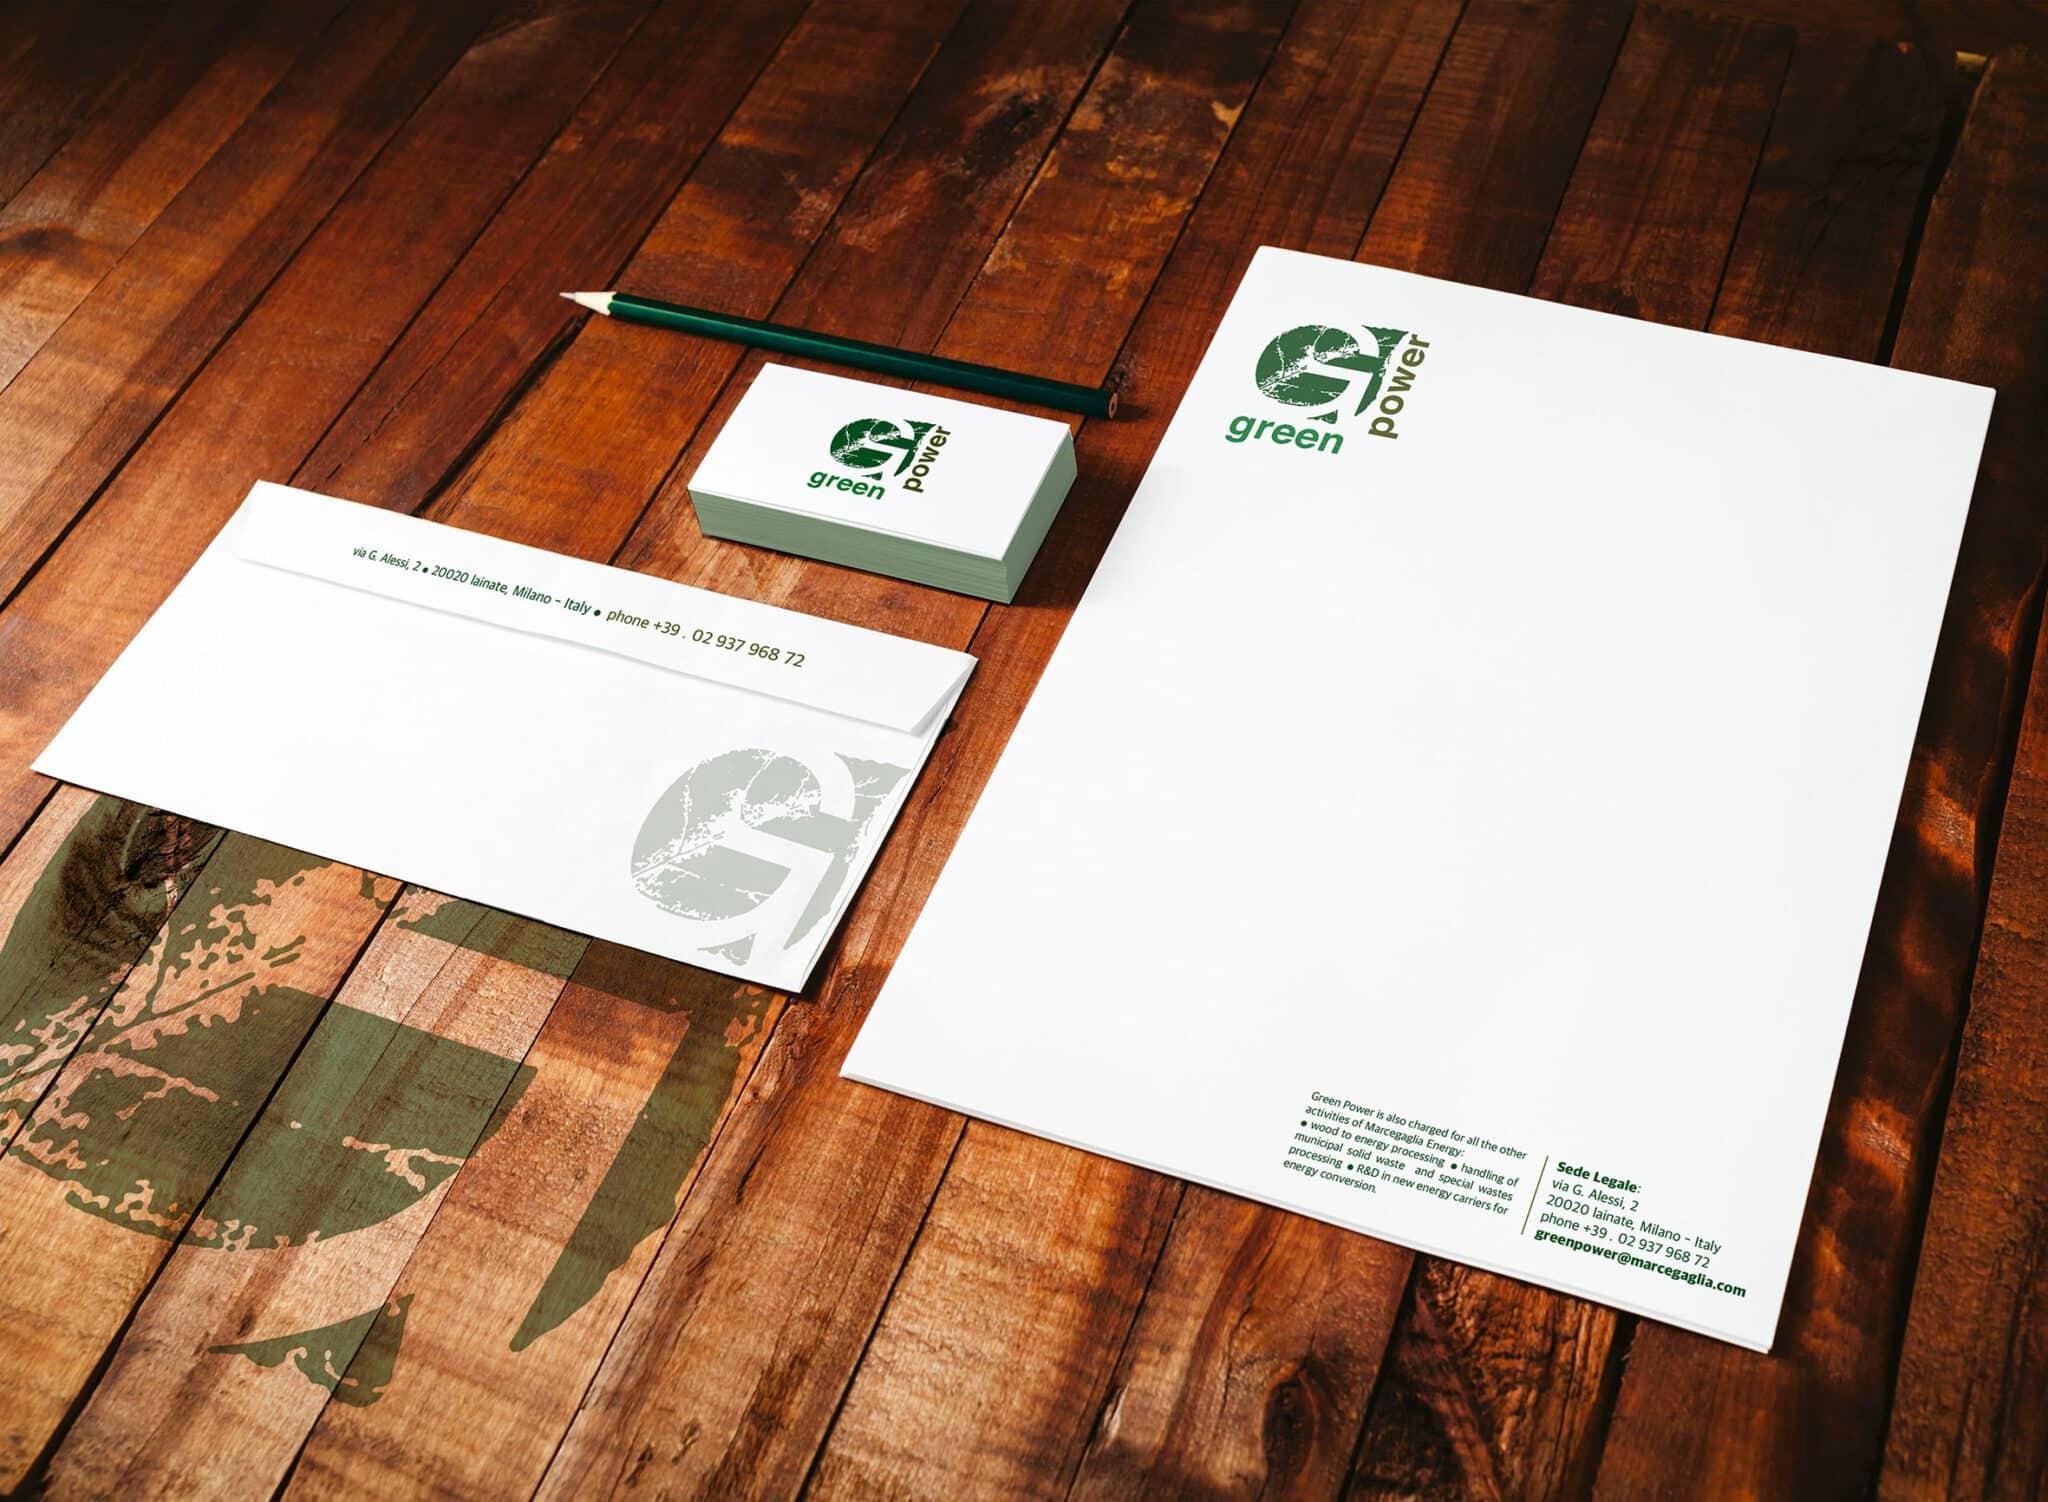 https://www.studiochiesa.it/wp-content/uploads/2020/07/SC-Studio-Chiesa-Communication_Energia-Ambiente-Green-Power-corporate.jpg